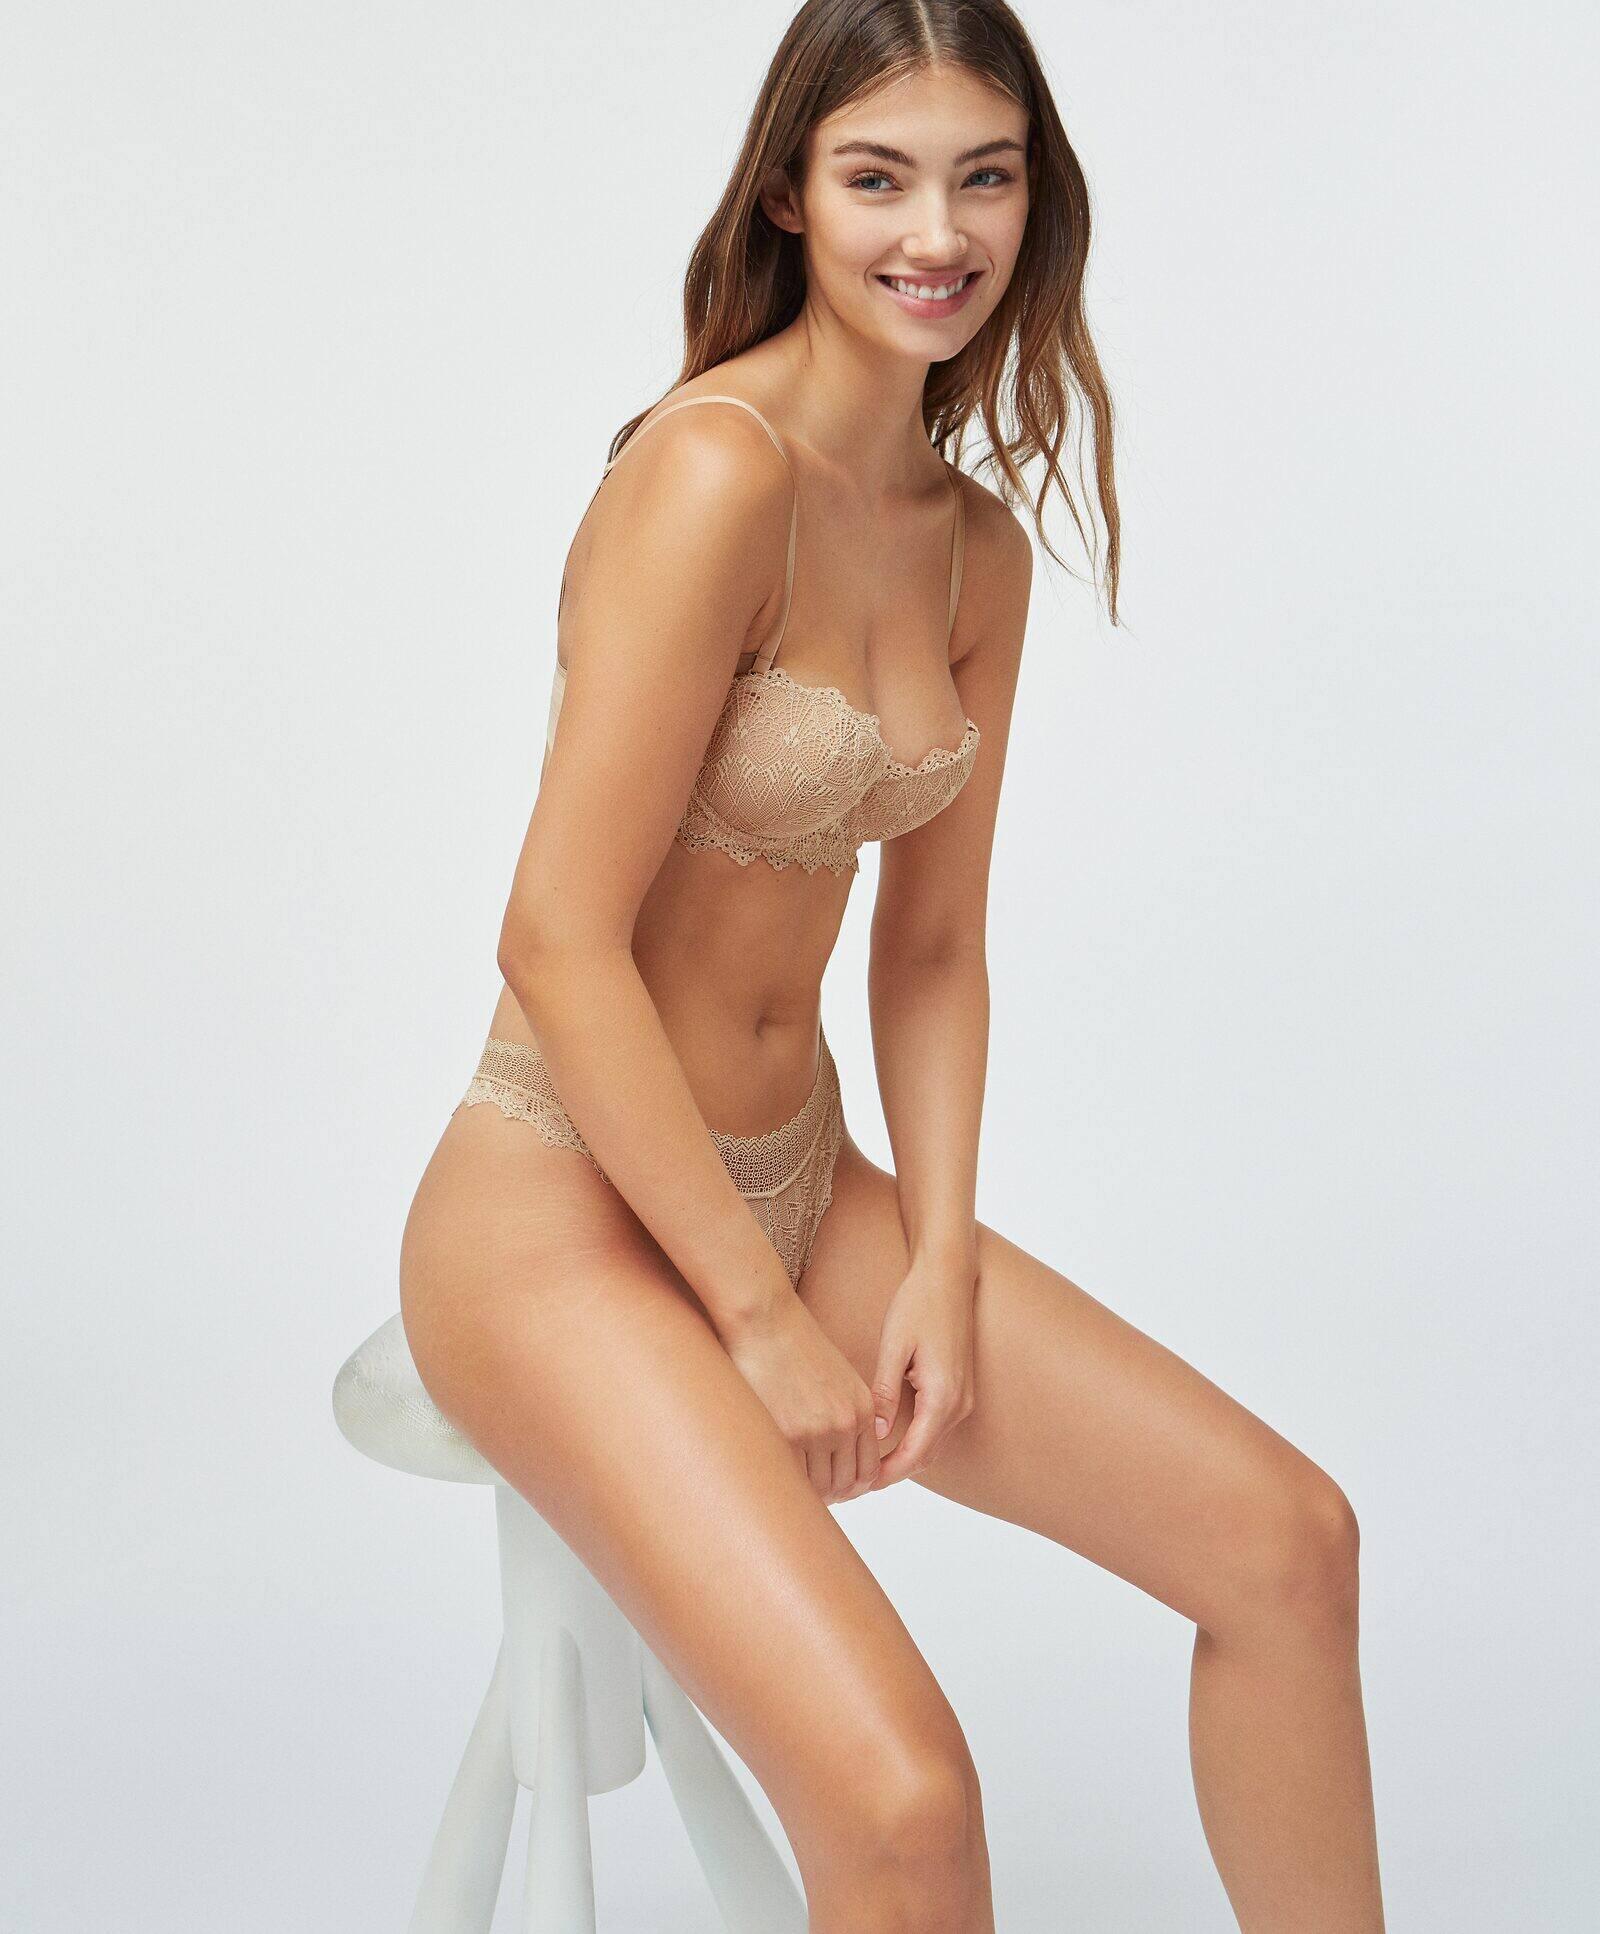 Lorena Rae Tiny Lingerie